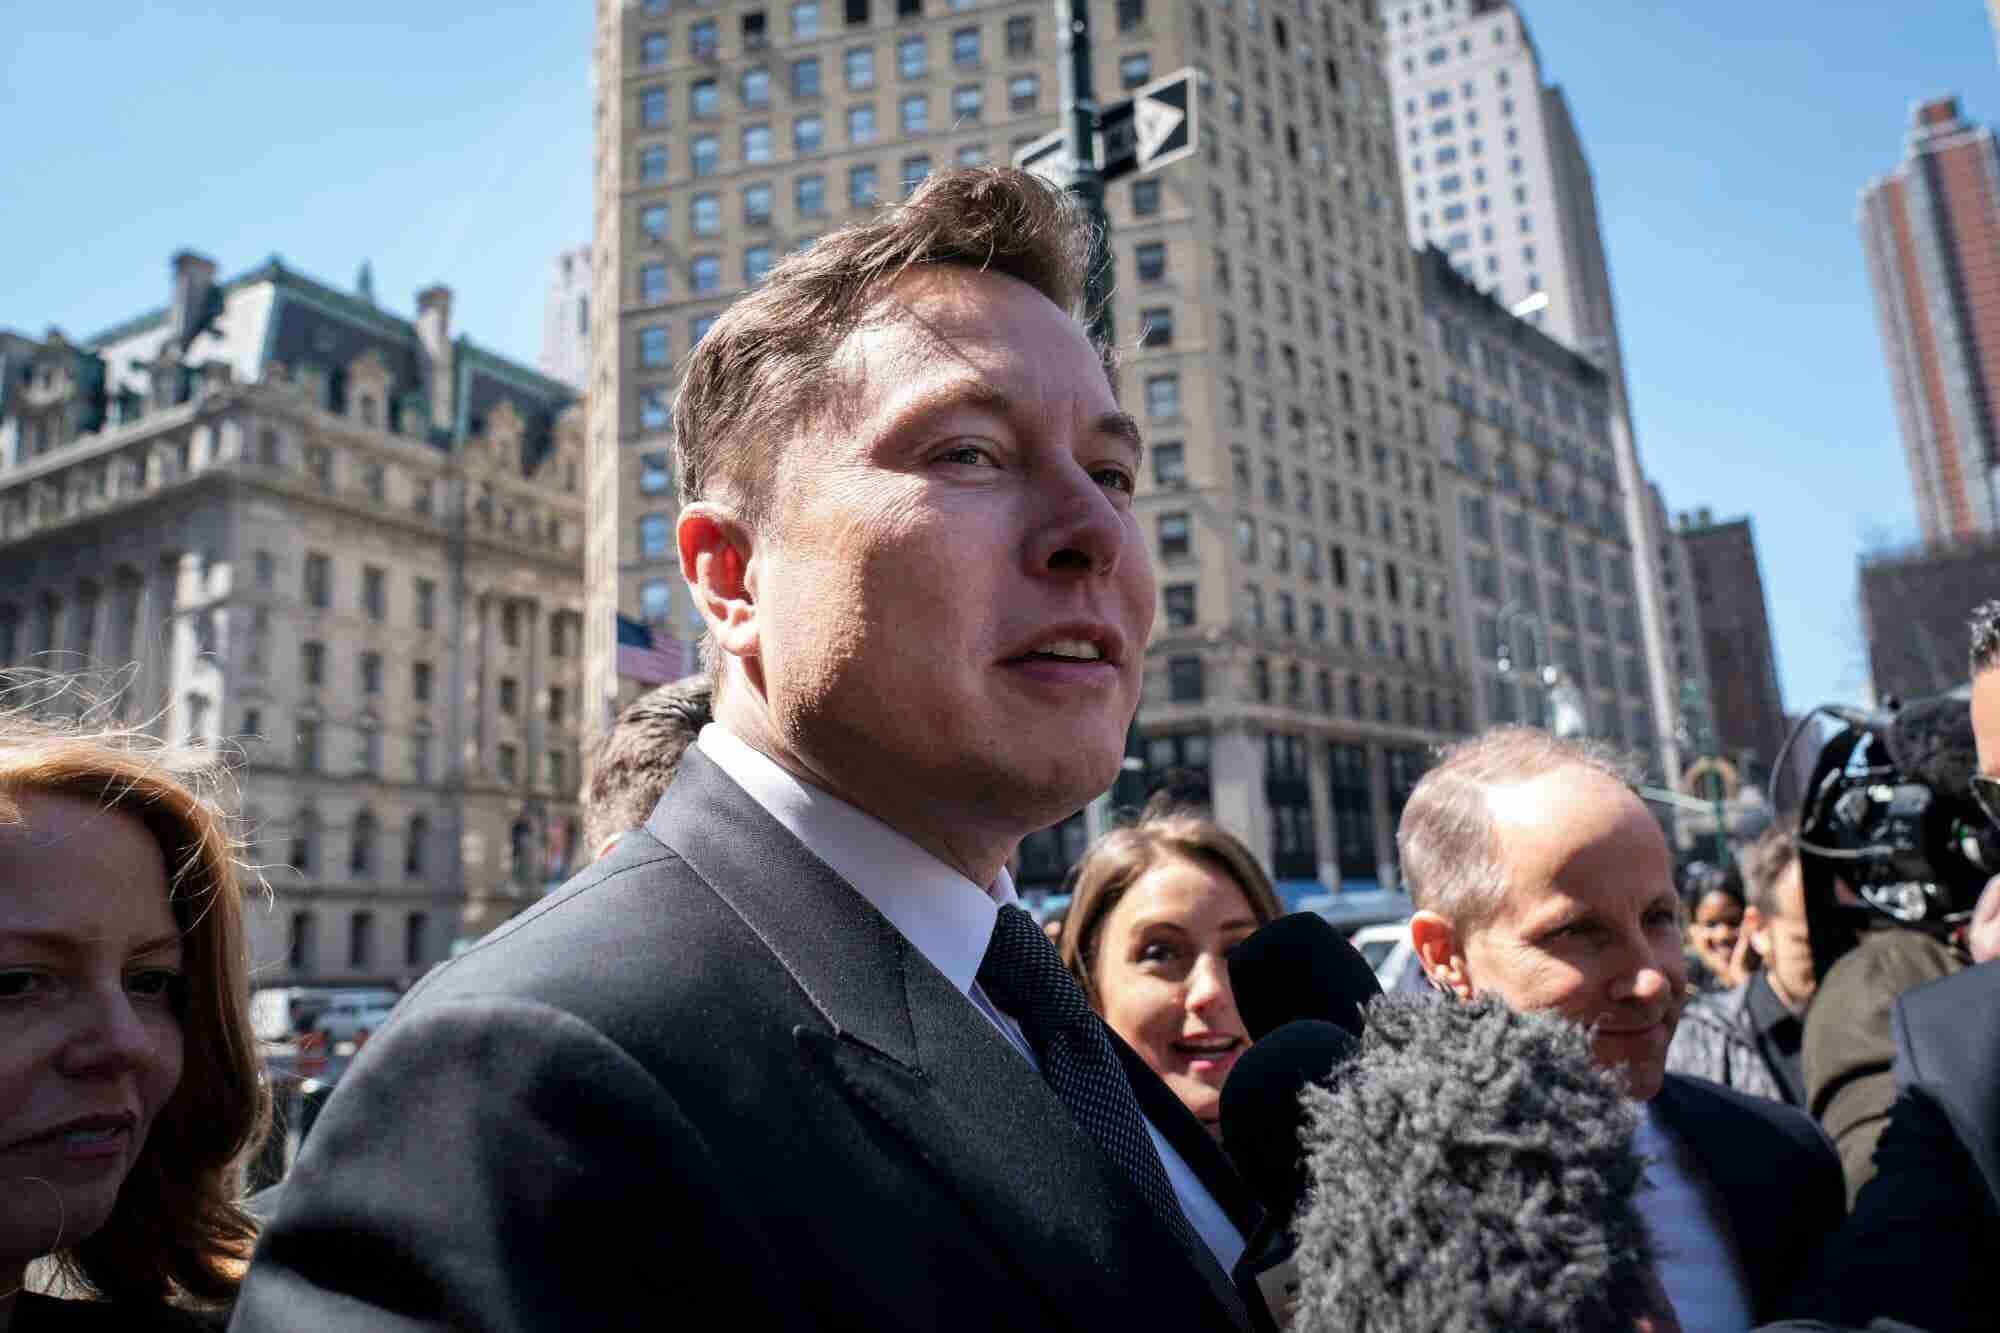 Tesla Stock Falls Hard Despite Elon Musk's Claim That It Will Eventually Have $500 Billion Market Cap